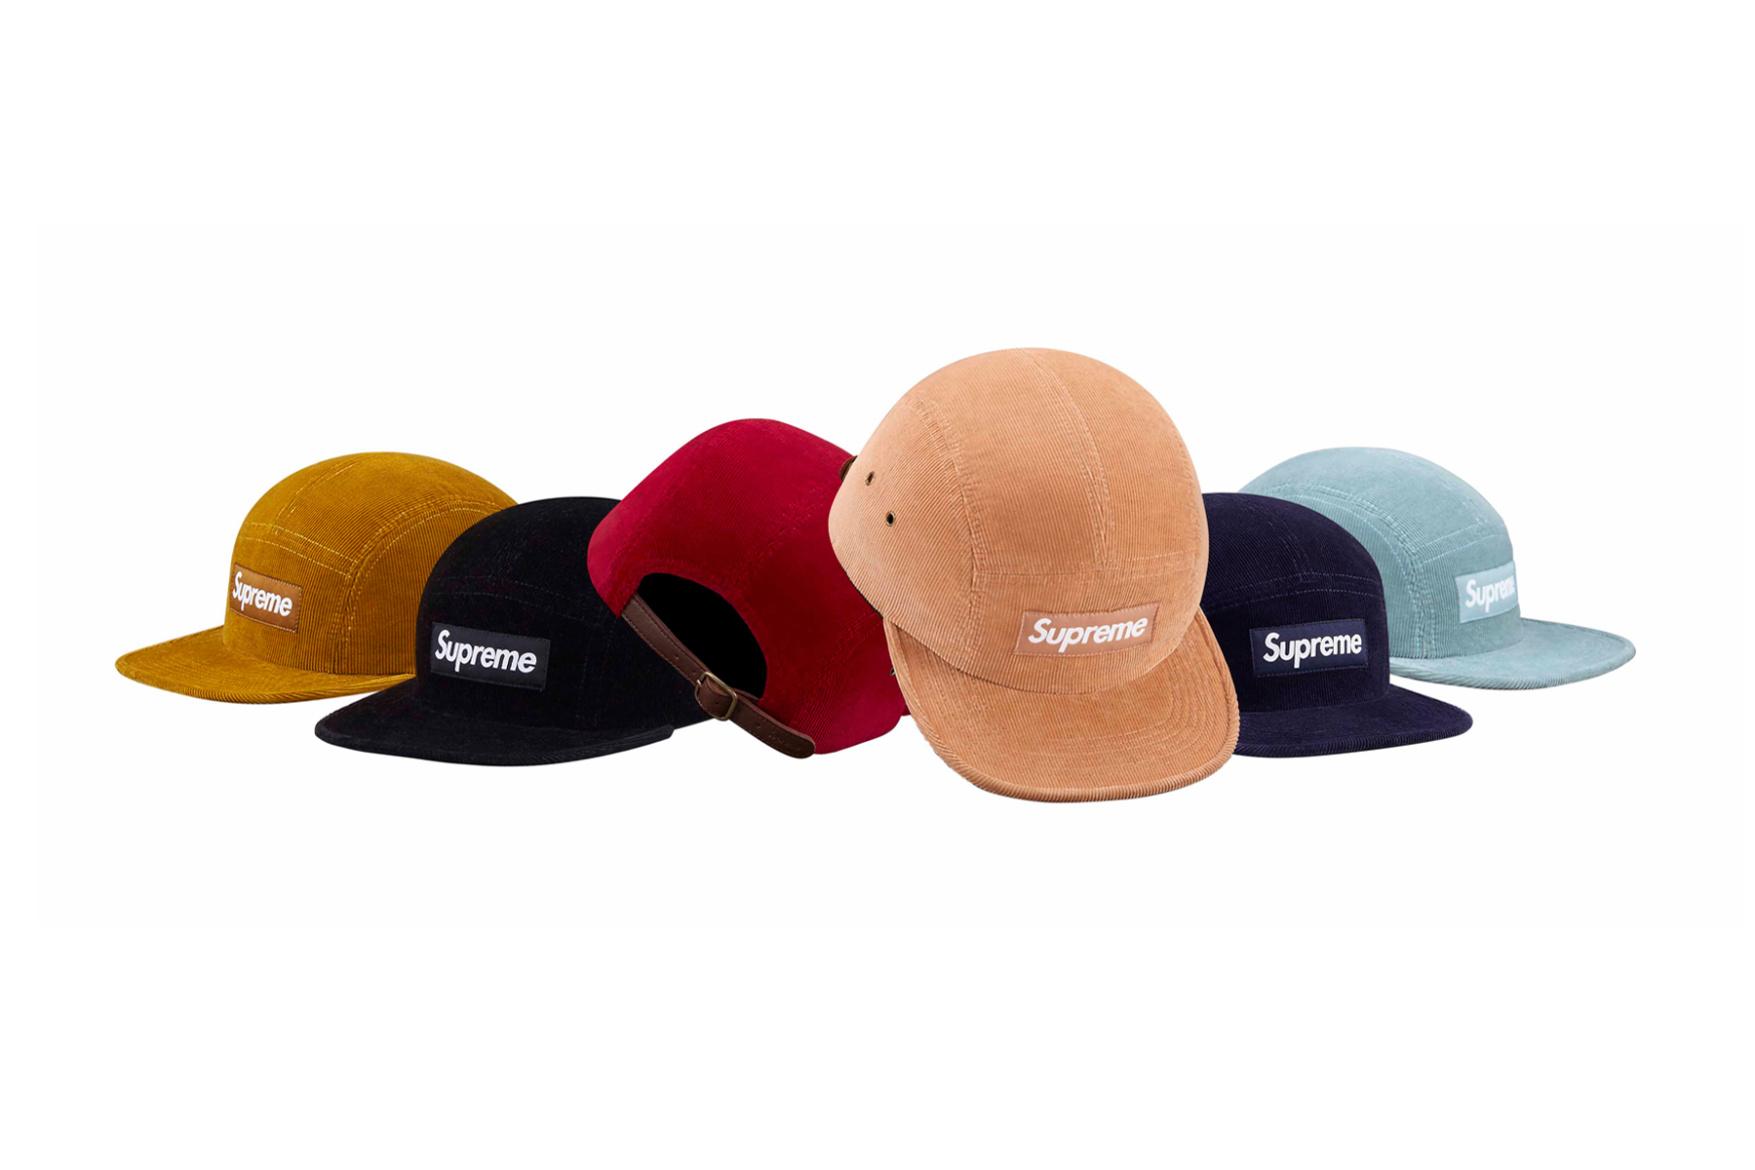 supreme-2016-fall-winter-headwear-14